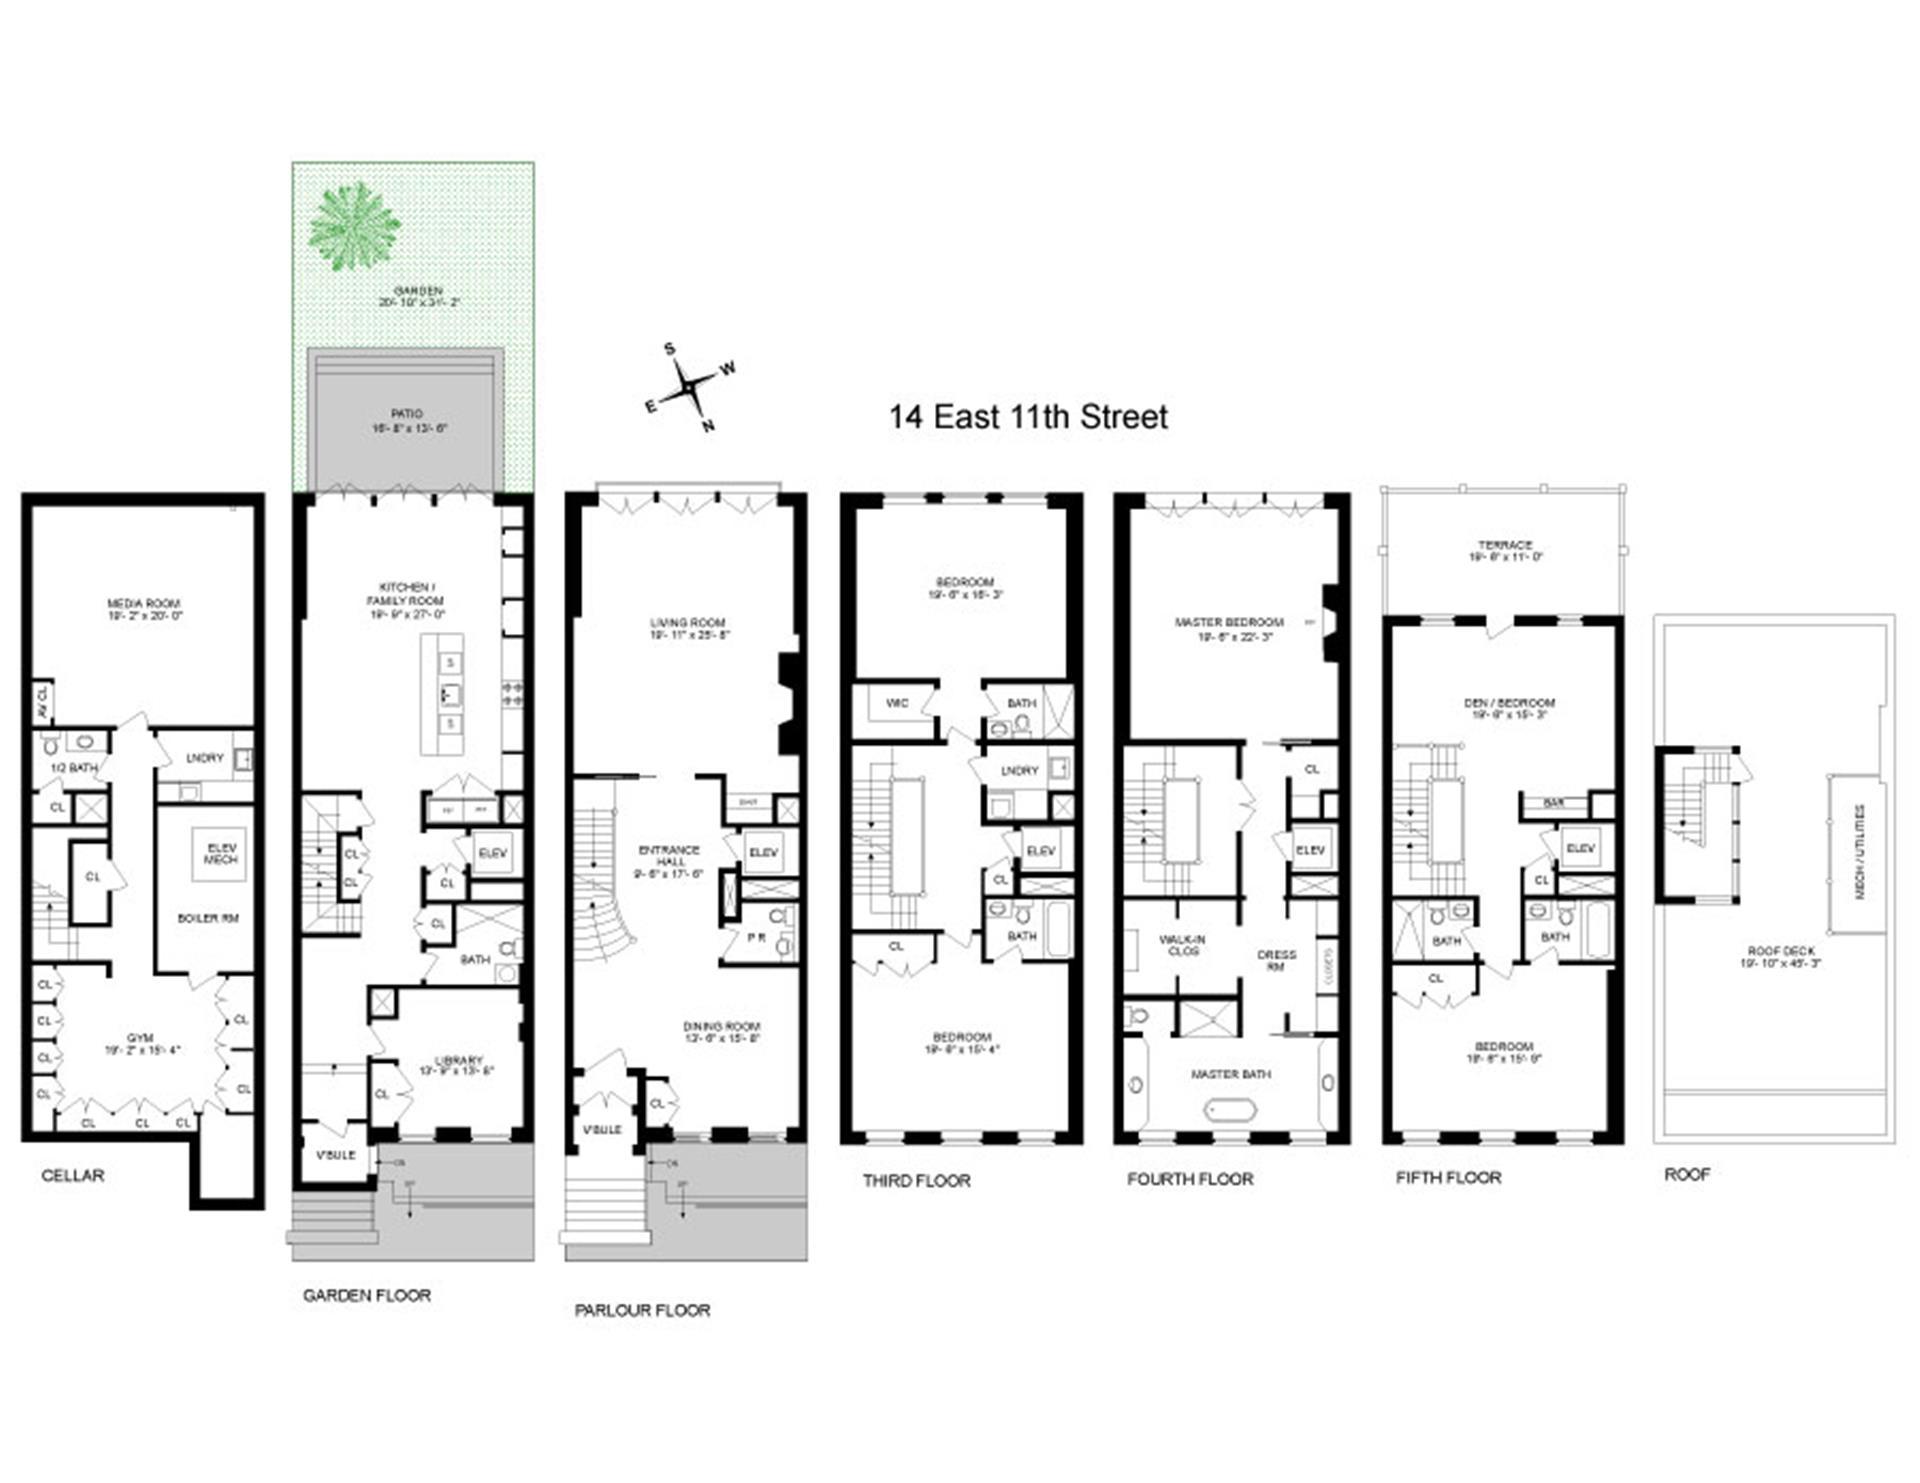 Floor plan of 14 East 11th St - Greenwich Village, New York